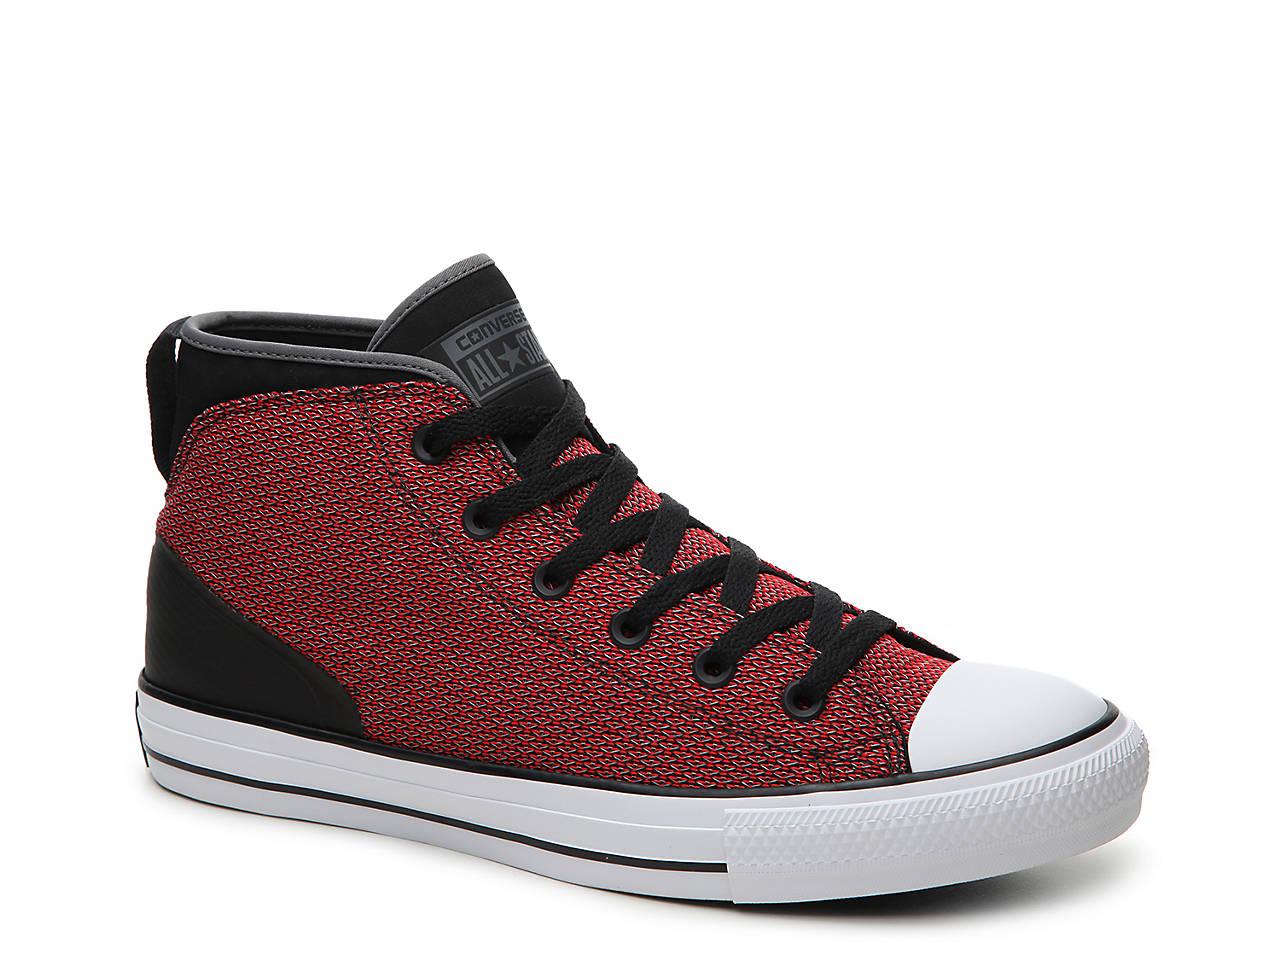 Chuck Taylor All Star Syde Street Woven High Top Sneaker Men's